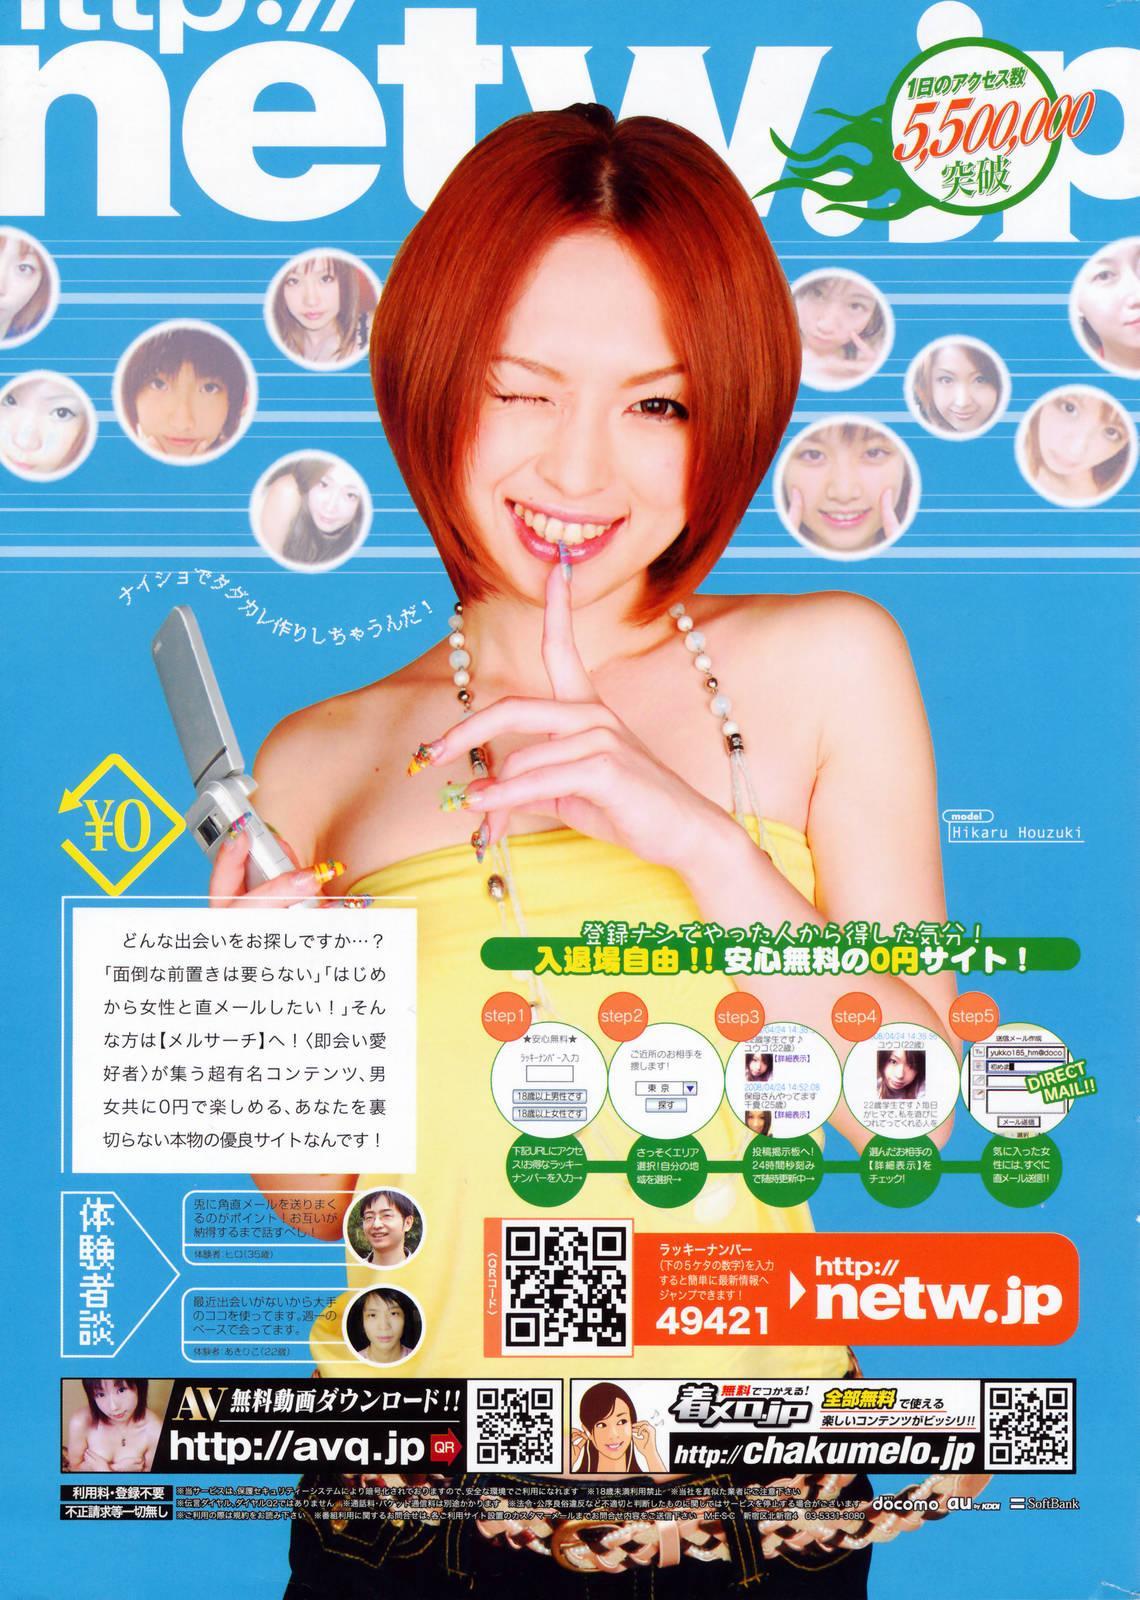 Manga Bangaichi 2009-02 Vol. 234 278